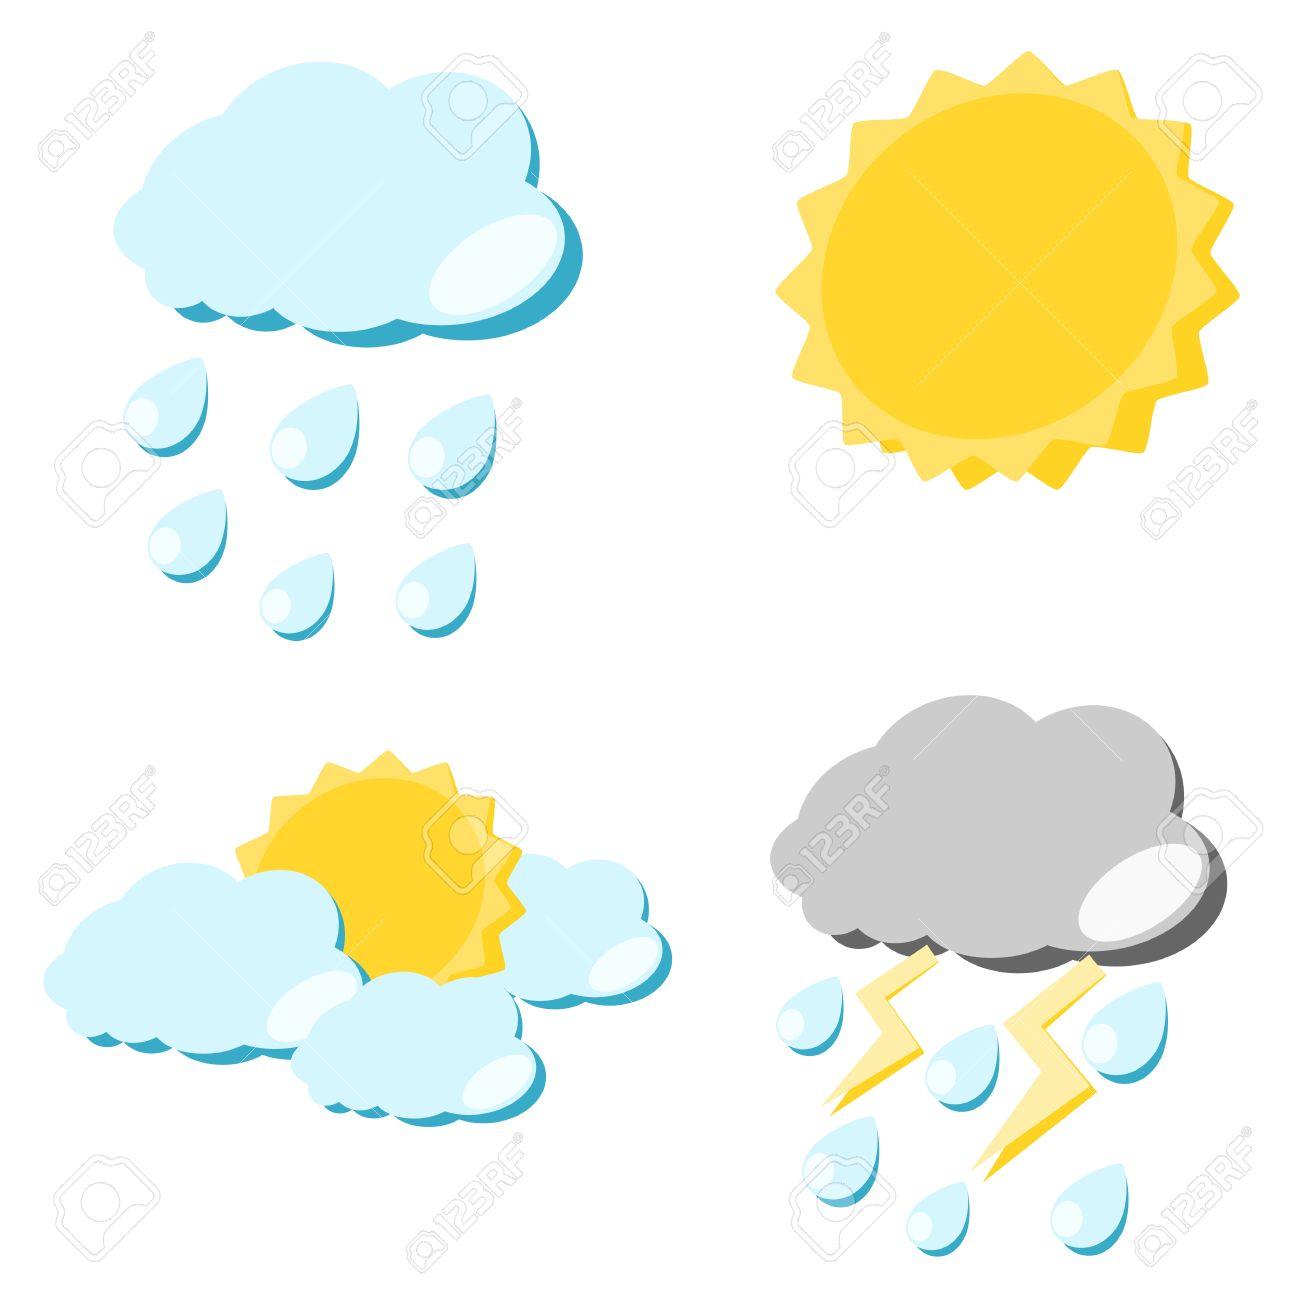 hight resolution of 1300x1300 rain clipart sun cloud